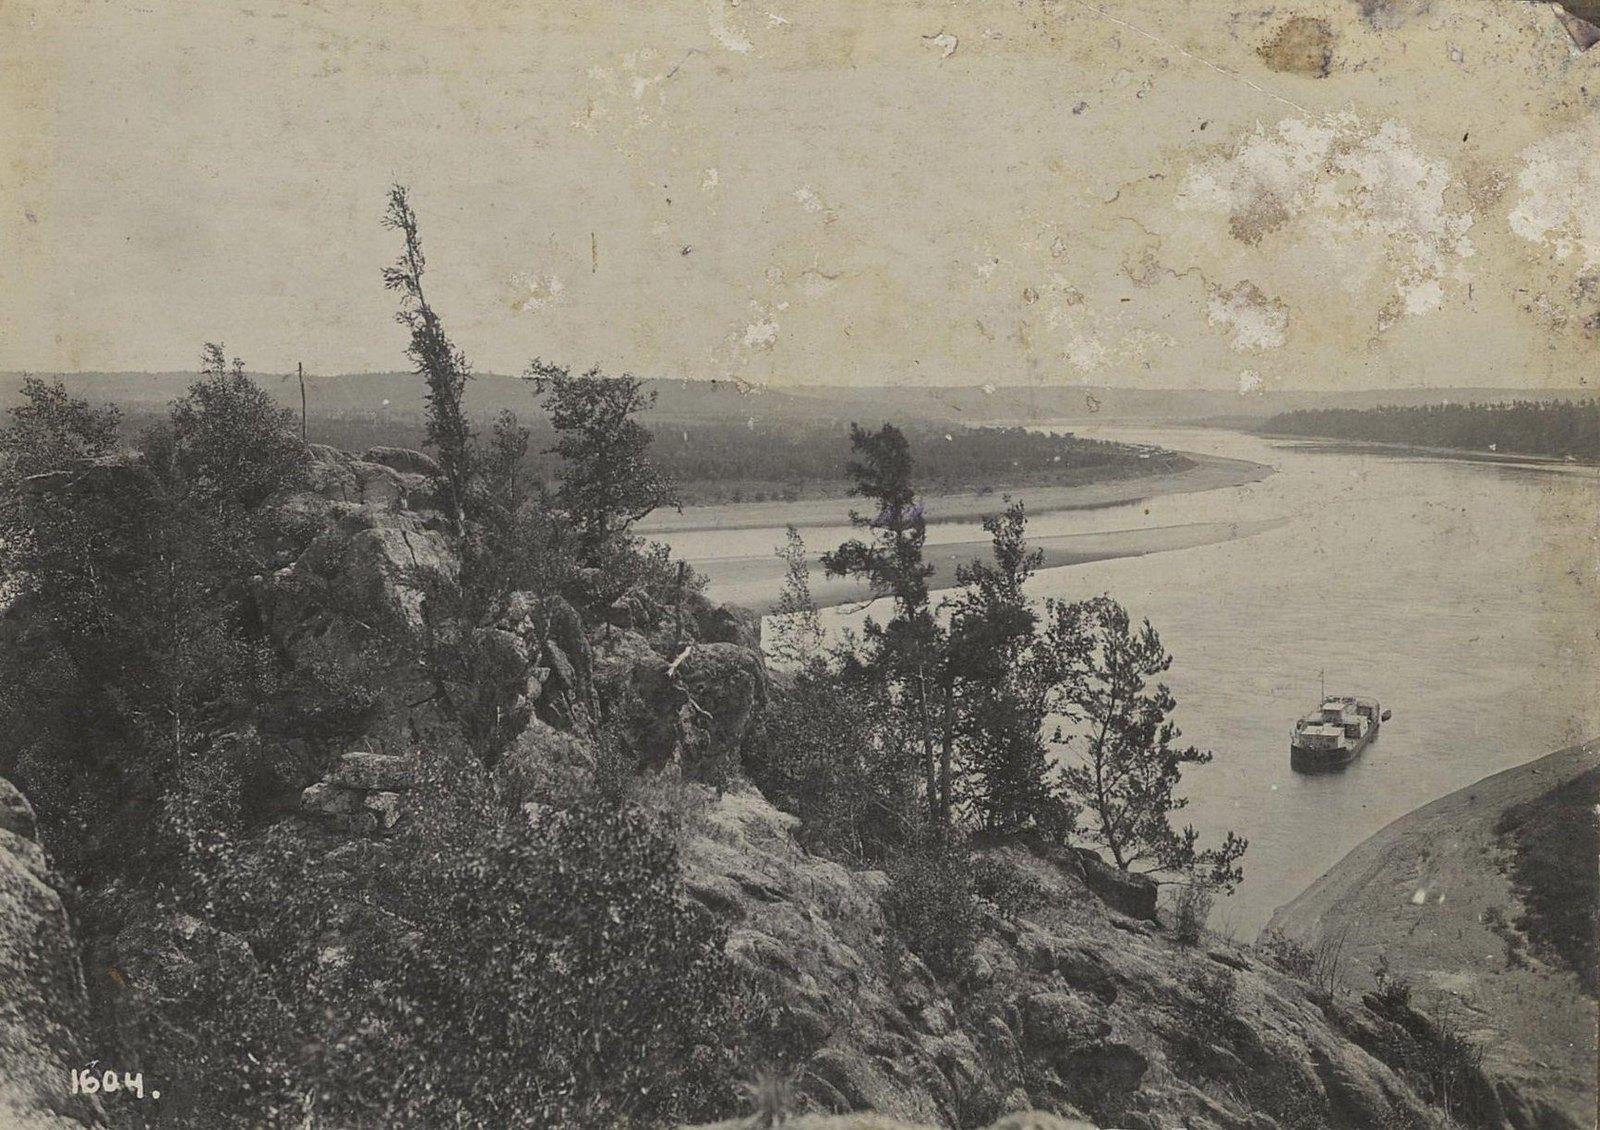 1604. Вид с водоворотного утёса